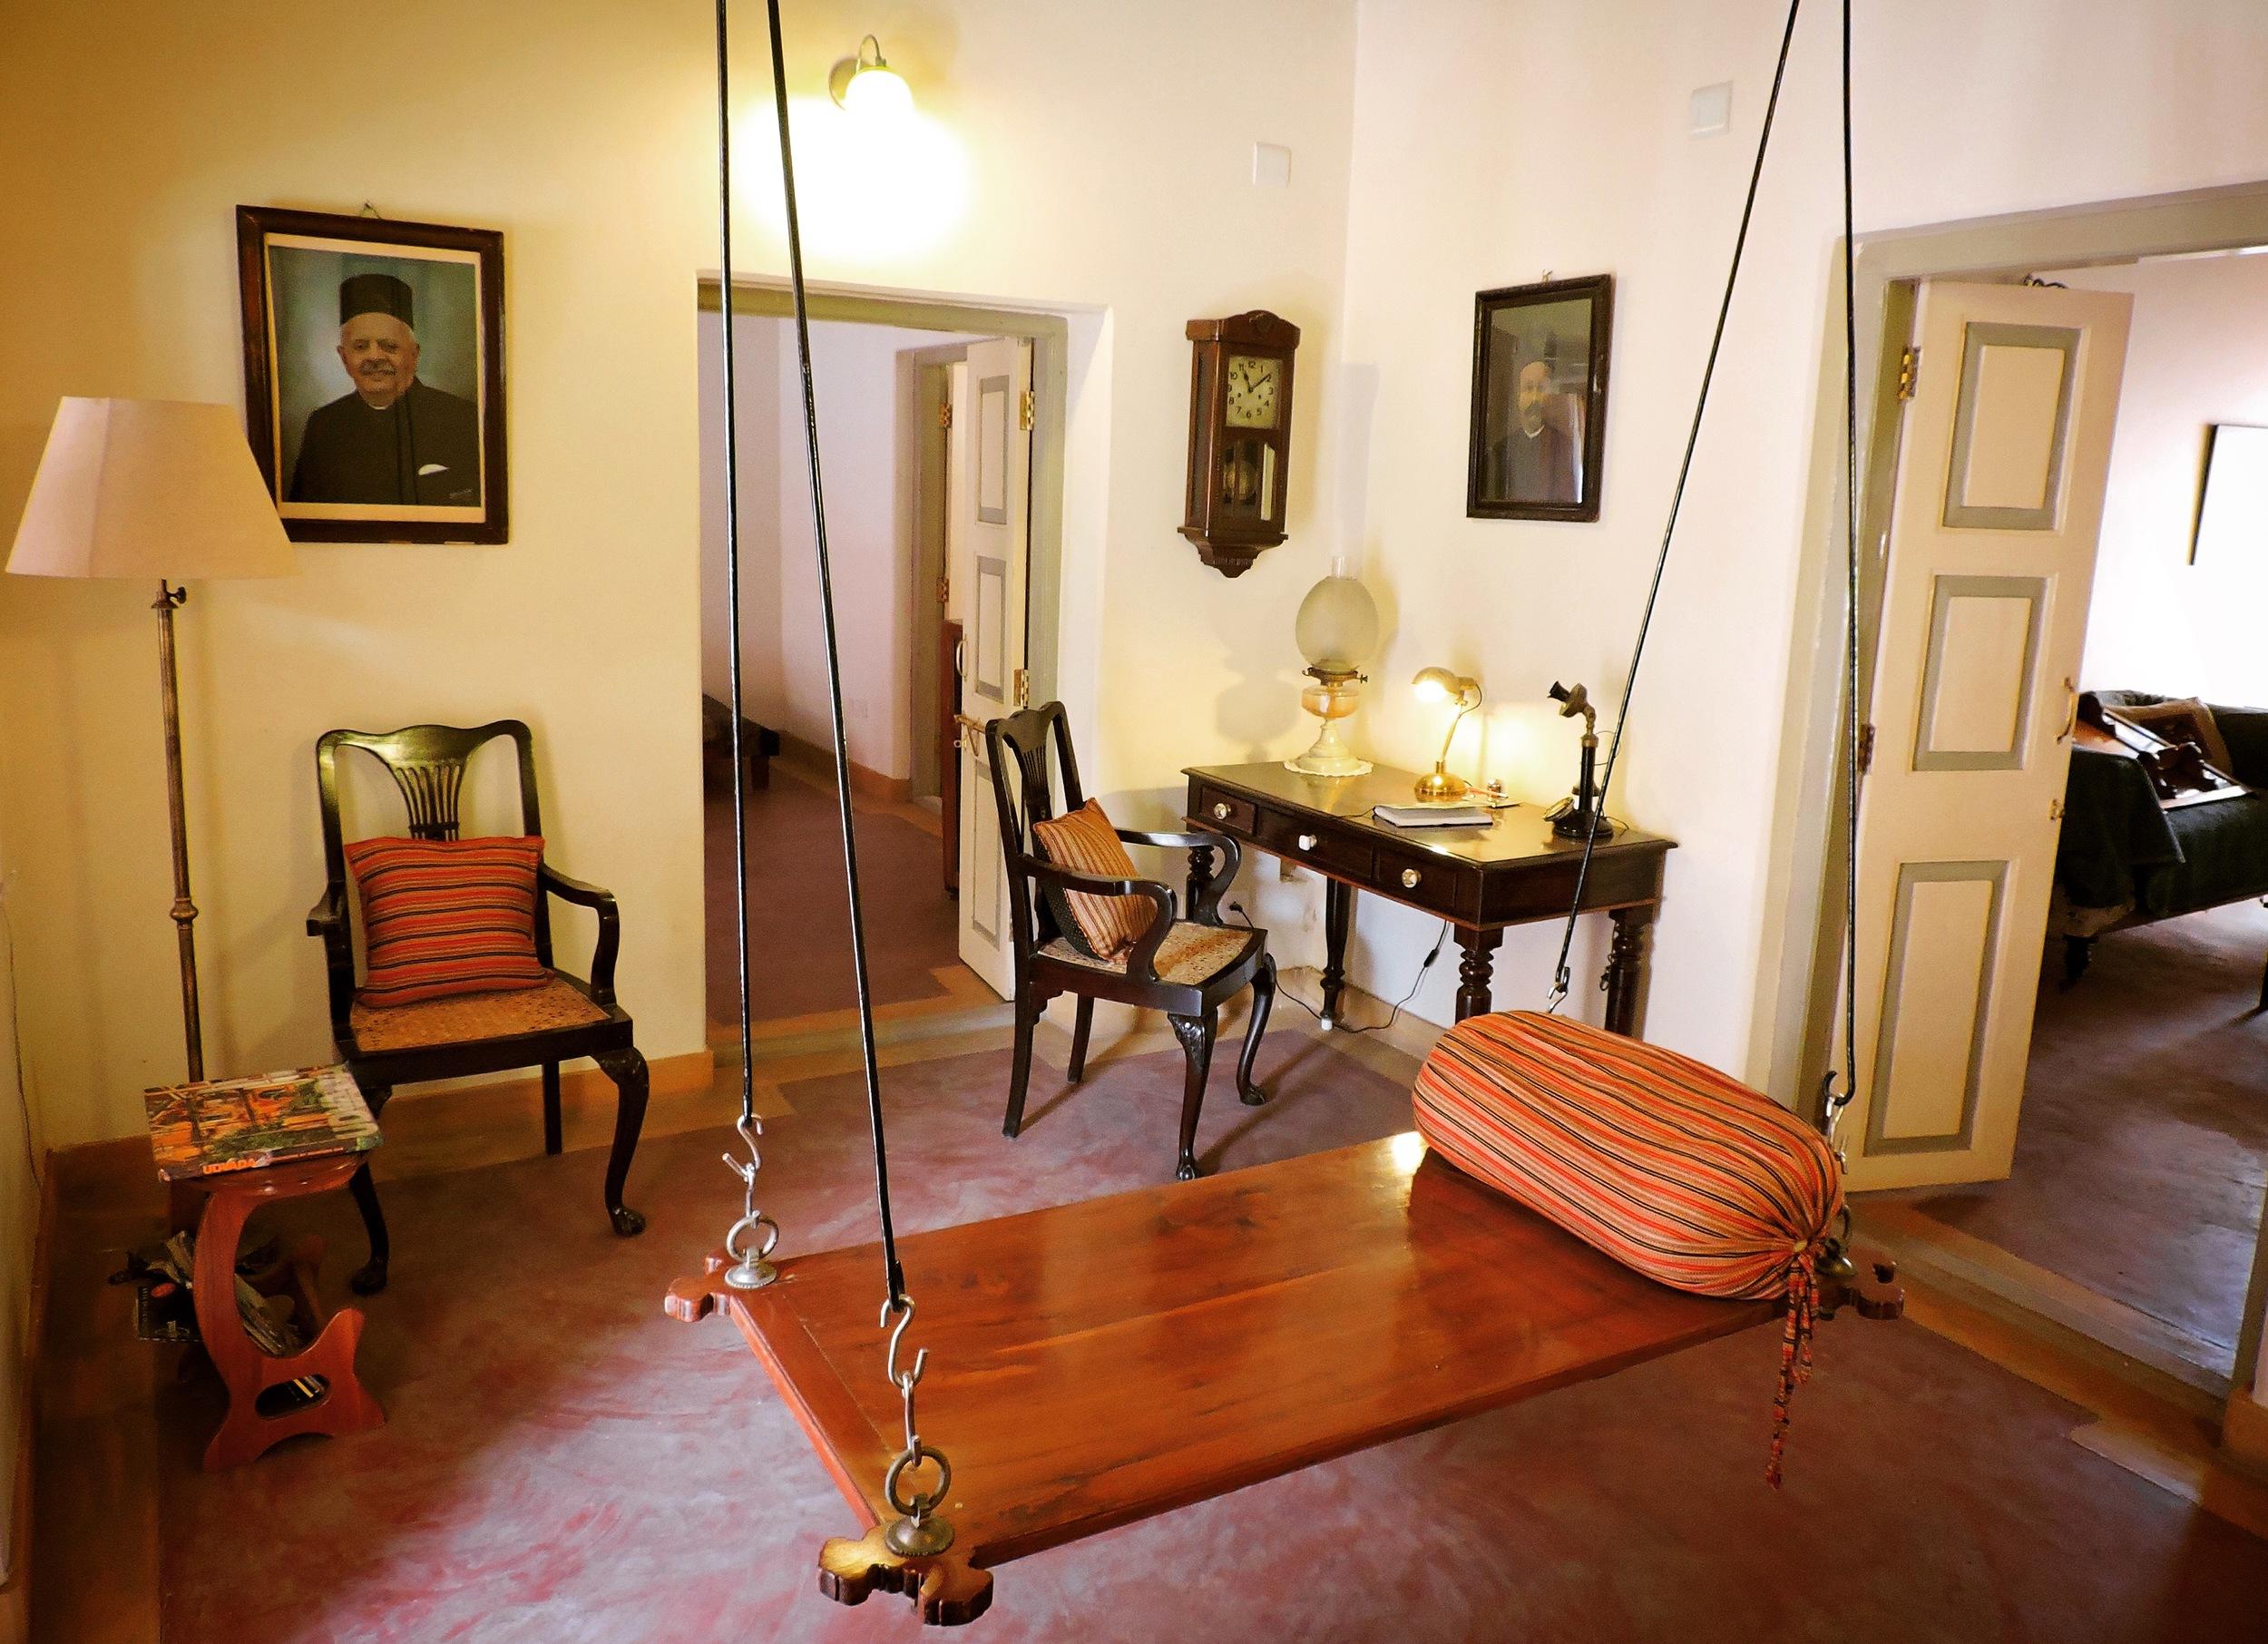 ...enter through the original hitchka (swing) room...